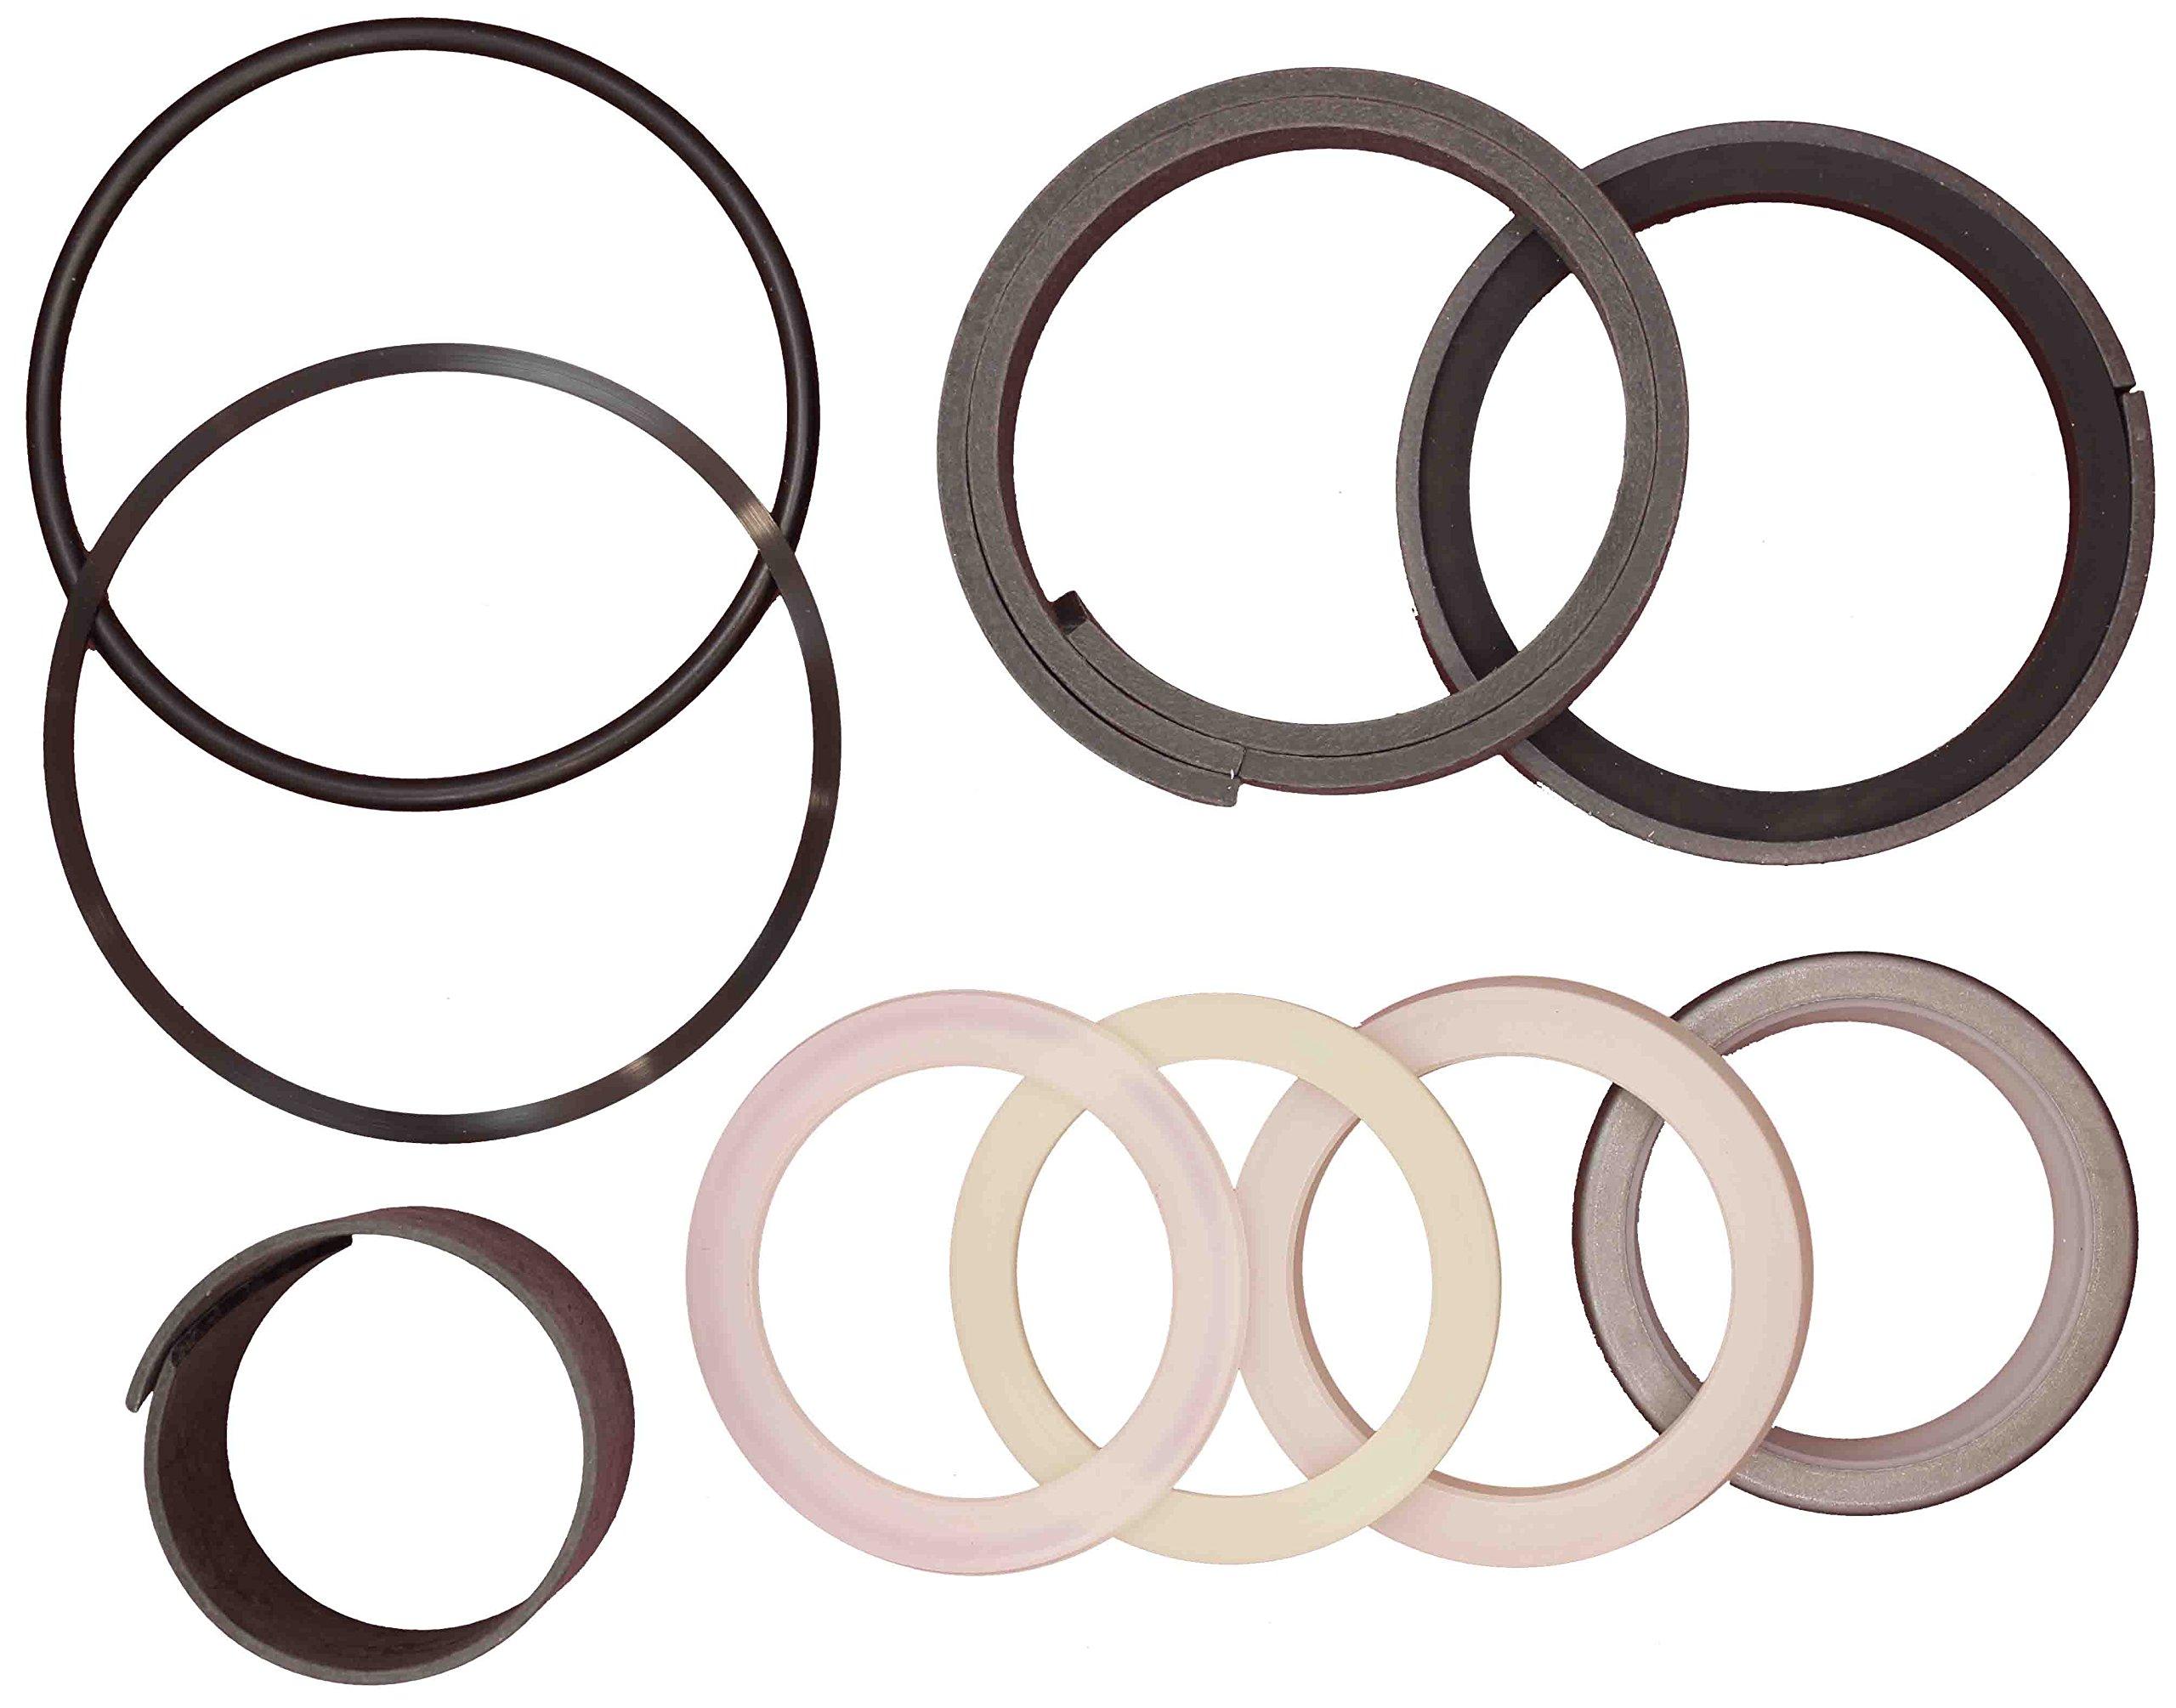 TORNADO HEAVY EQUIPMENT PARTS 1543262C1 Case G105549 Hydraulic Cylinder Seal Kit